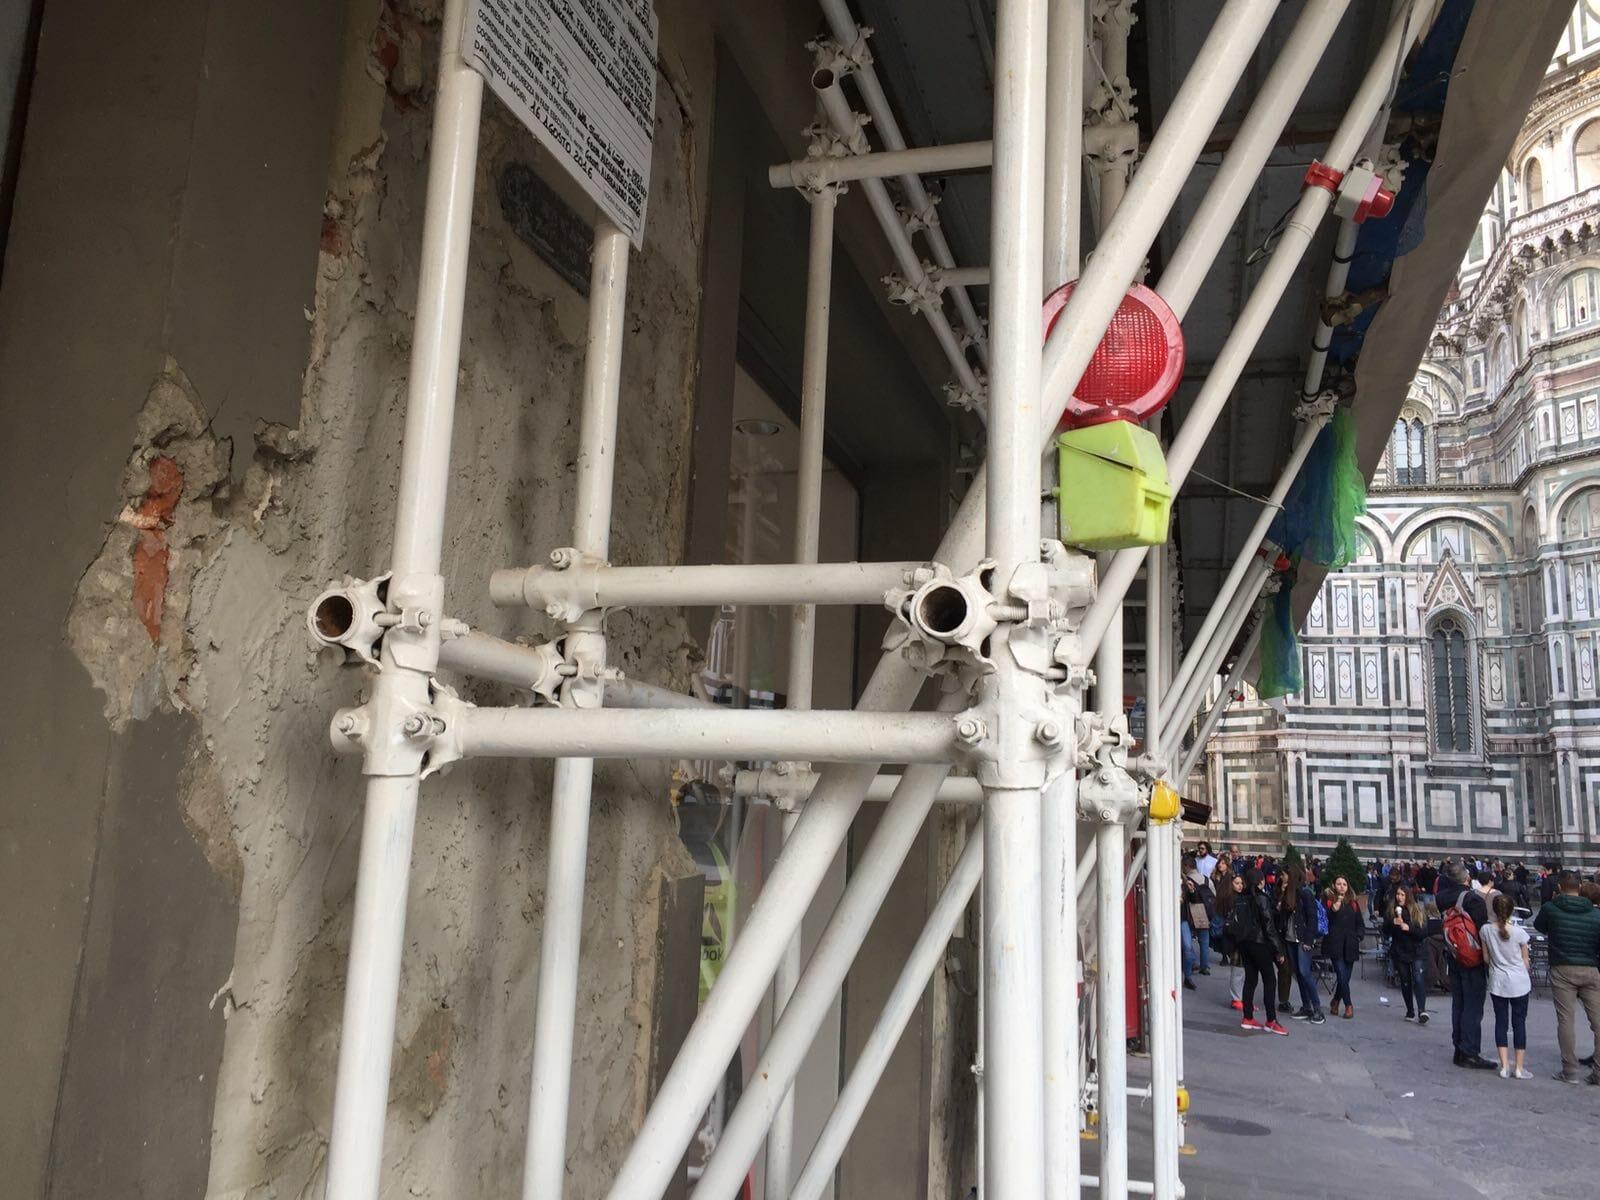 Pisa, lavoro in crisi